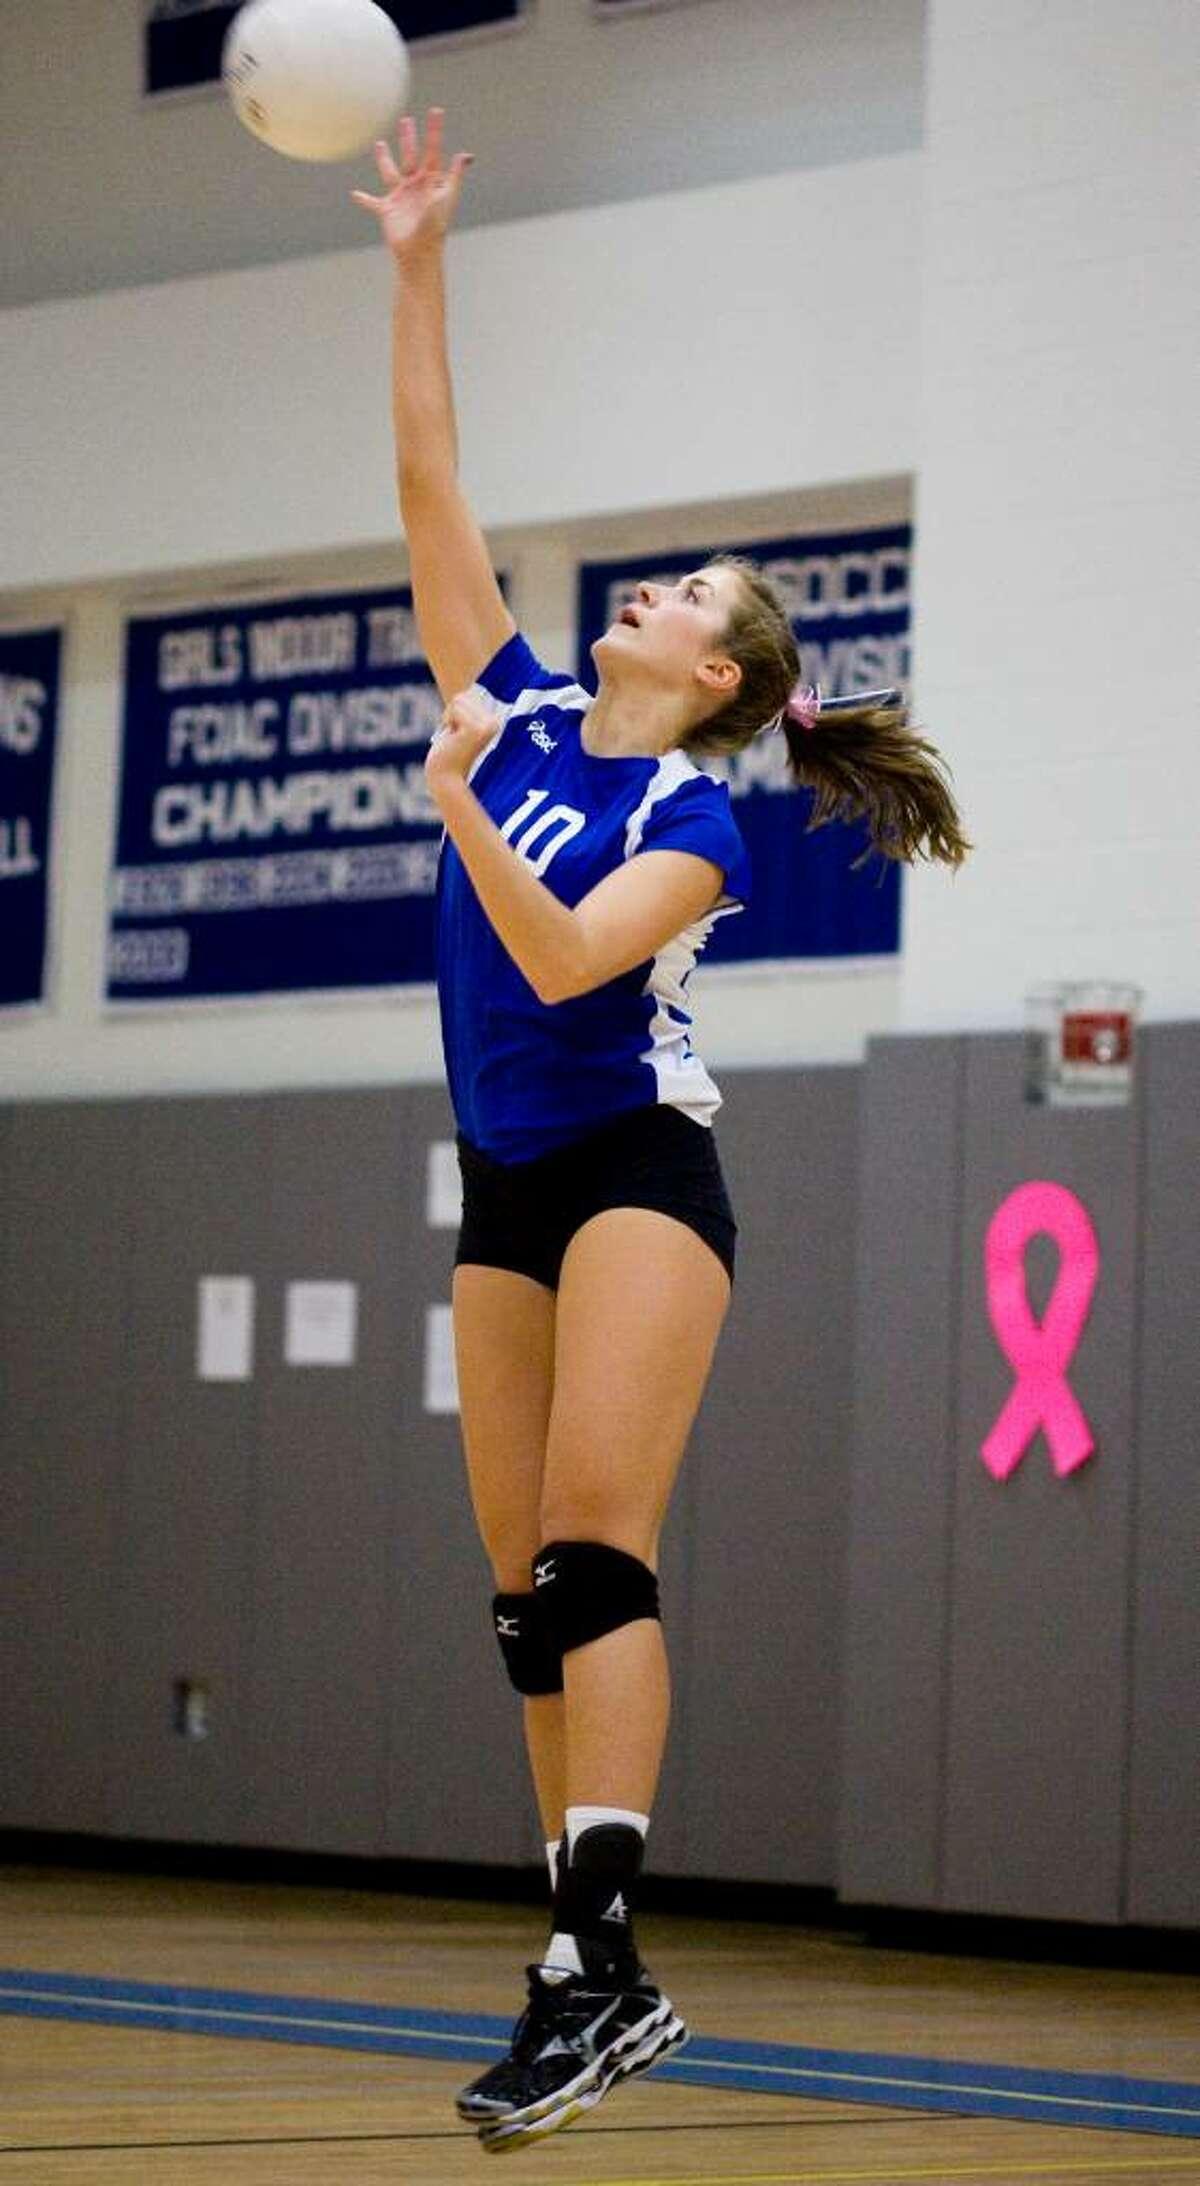 Darien High School's #10 Colby Billhardt serves during a game against Wilton High School in girls volleyball in Darien.